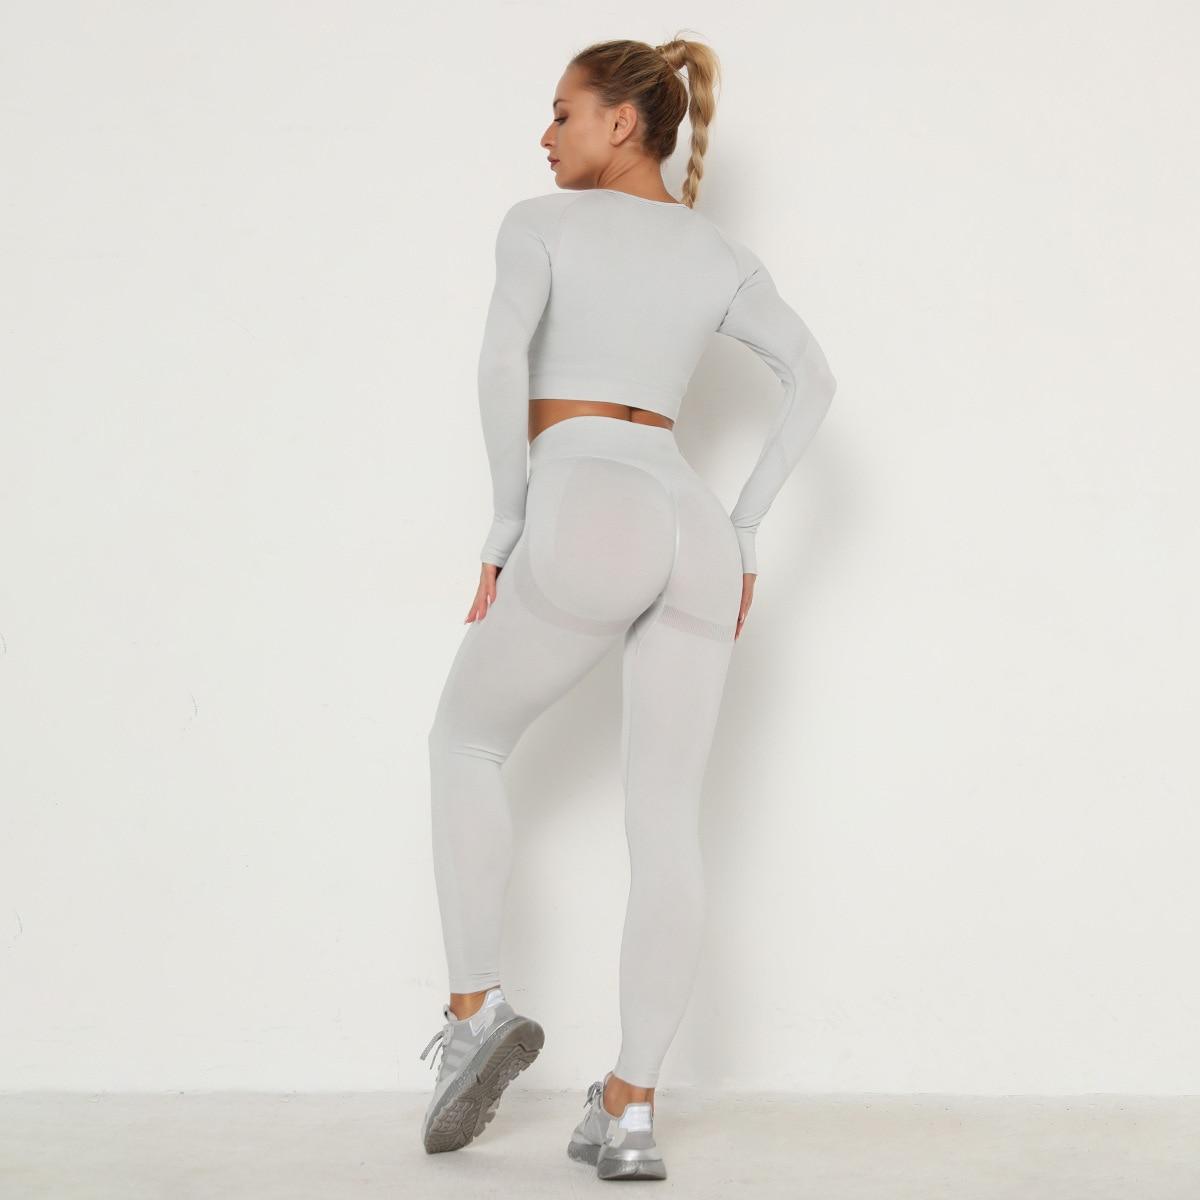 Women High Wais Leggings and Top Yoga Set